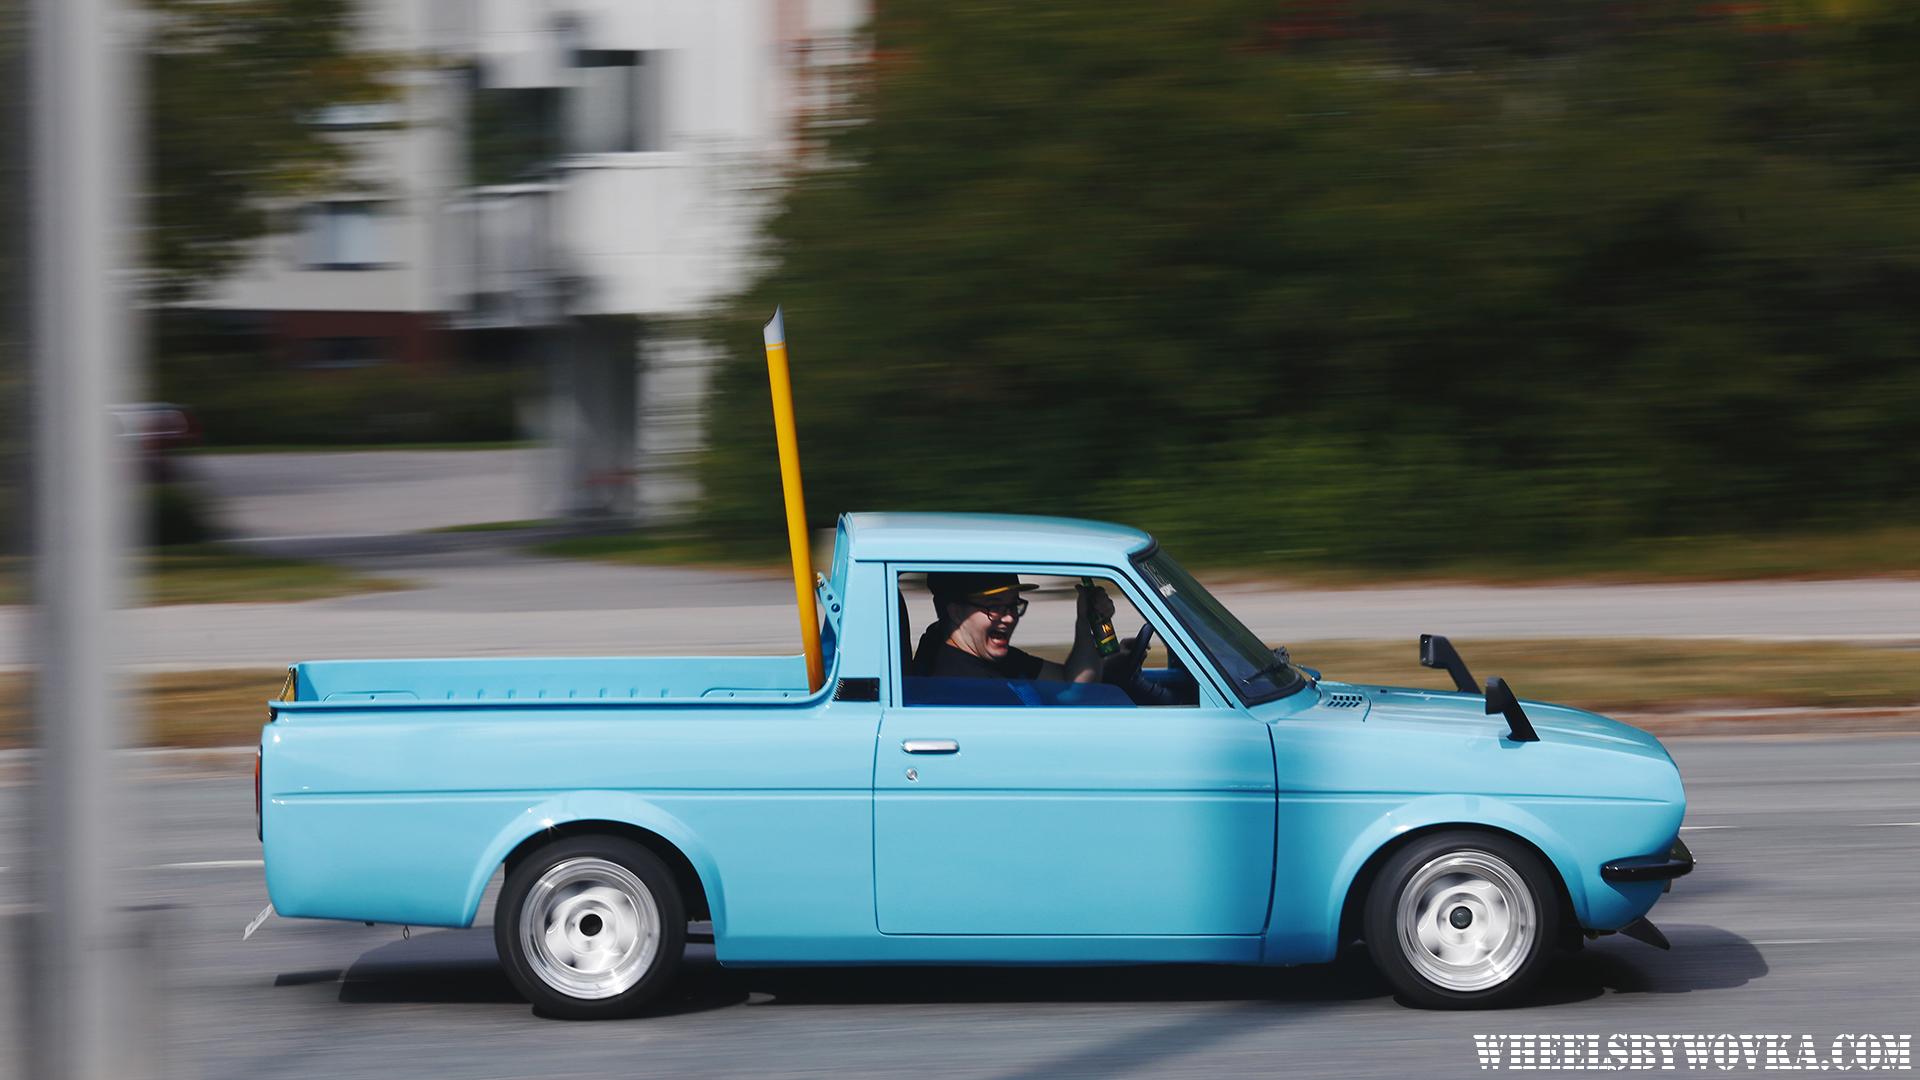 fitted-fest-lahti-finland-cdlcco-2018-by-wheelsbywovka-3